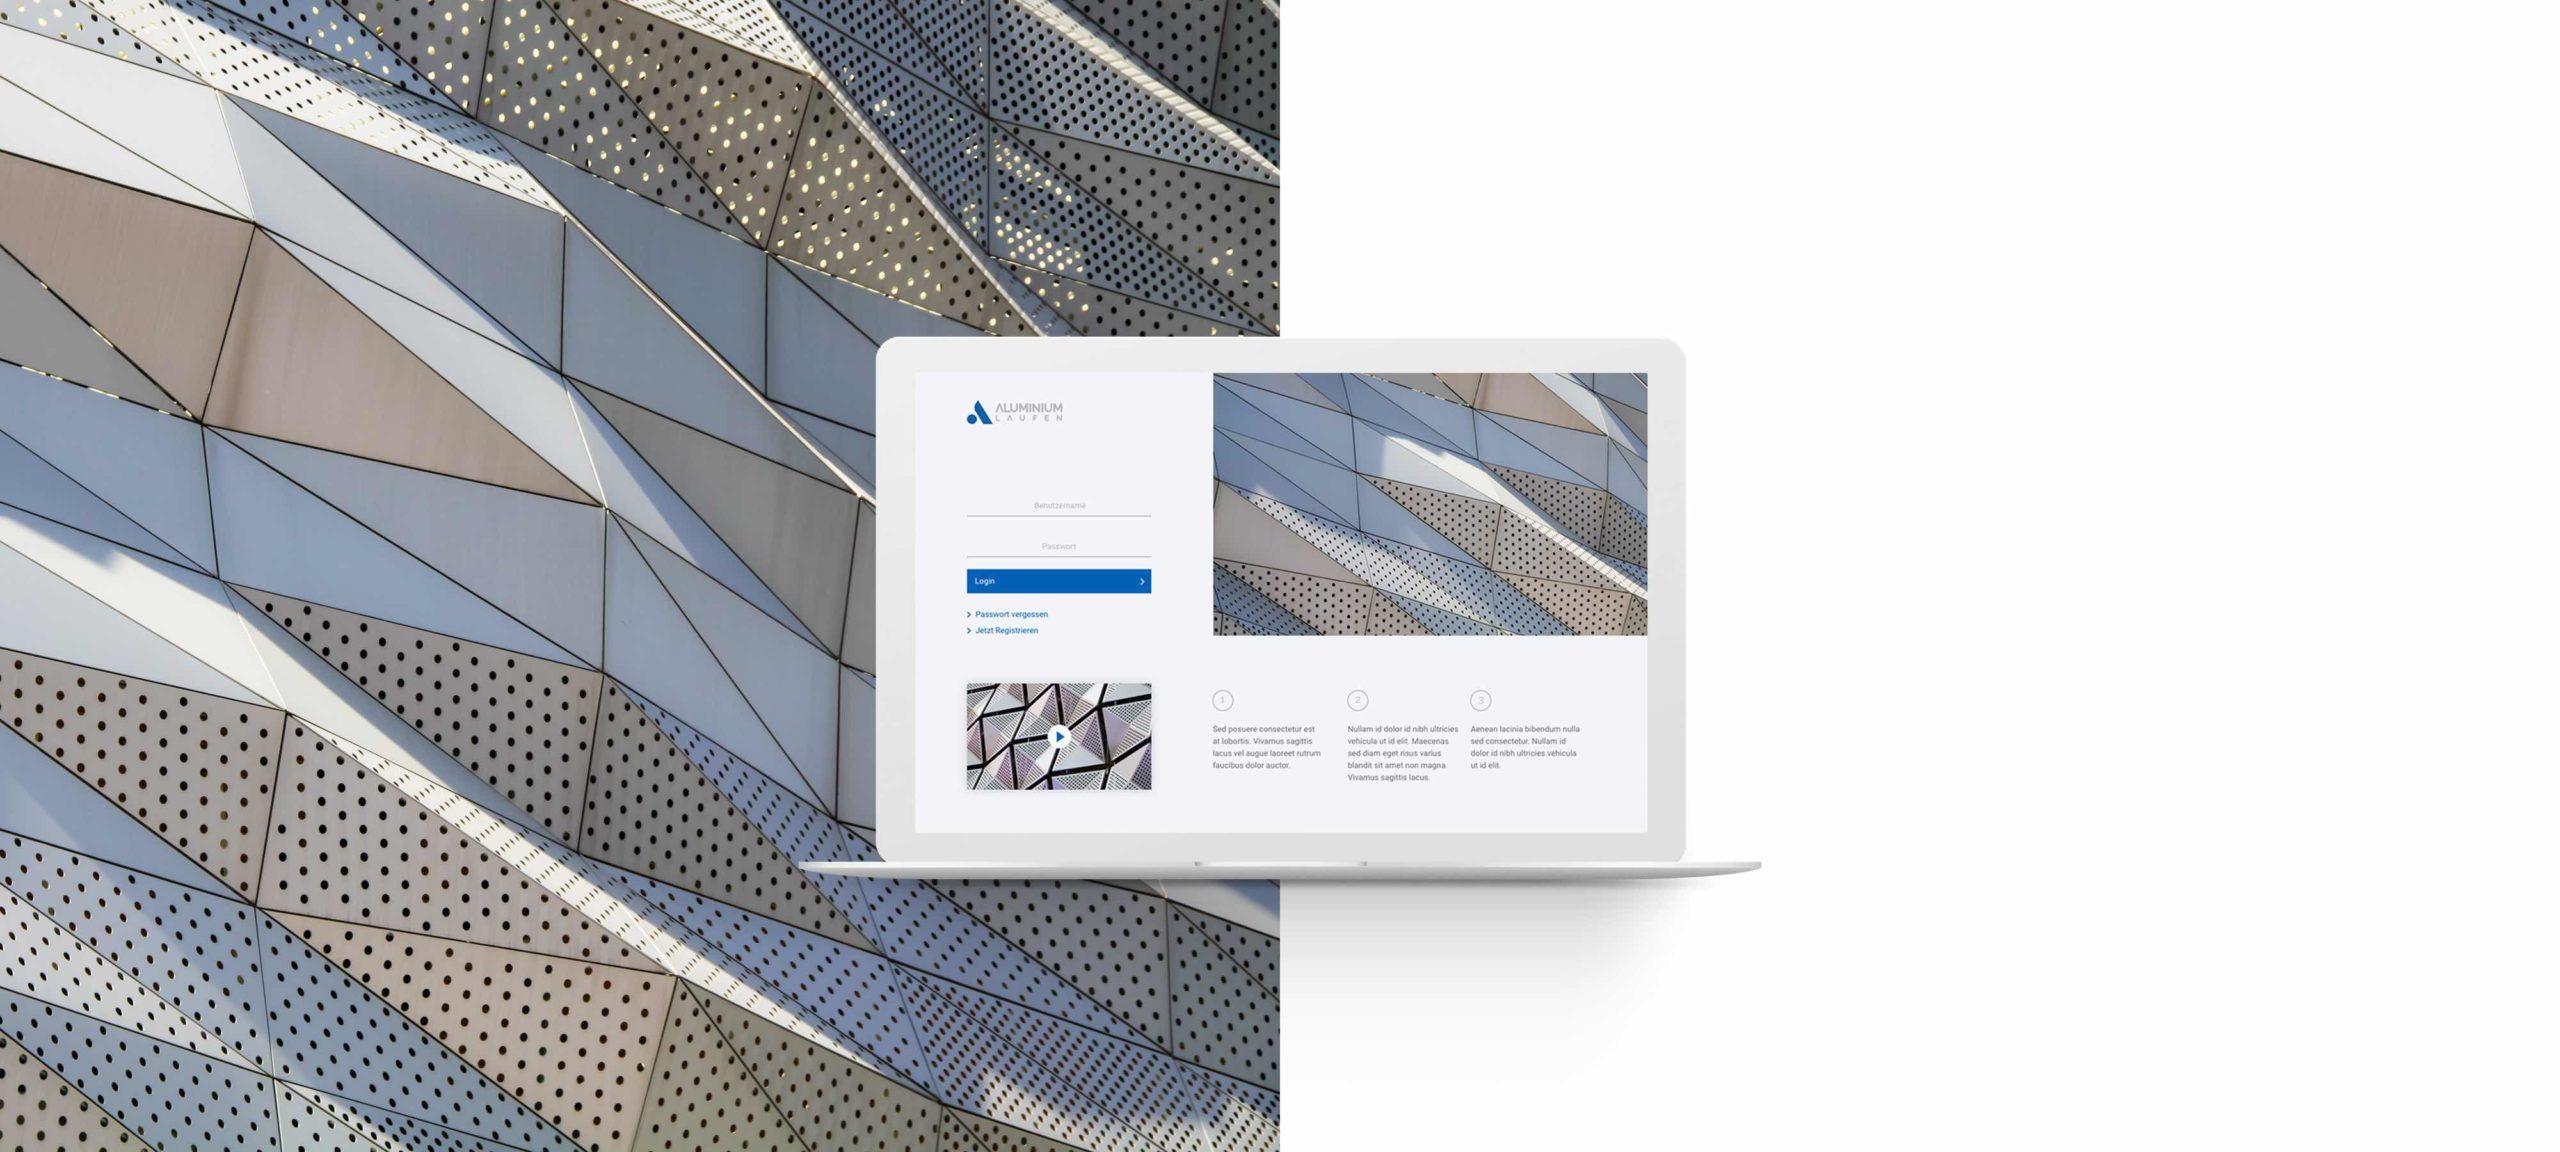 Aluminium Laufen Website visualisiert auf einem Laptop